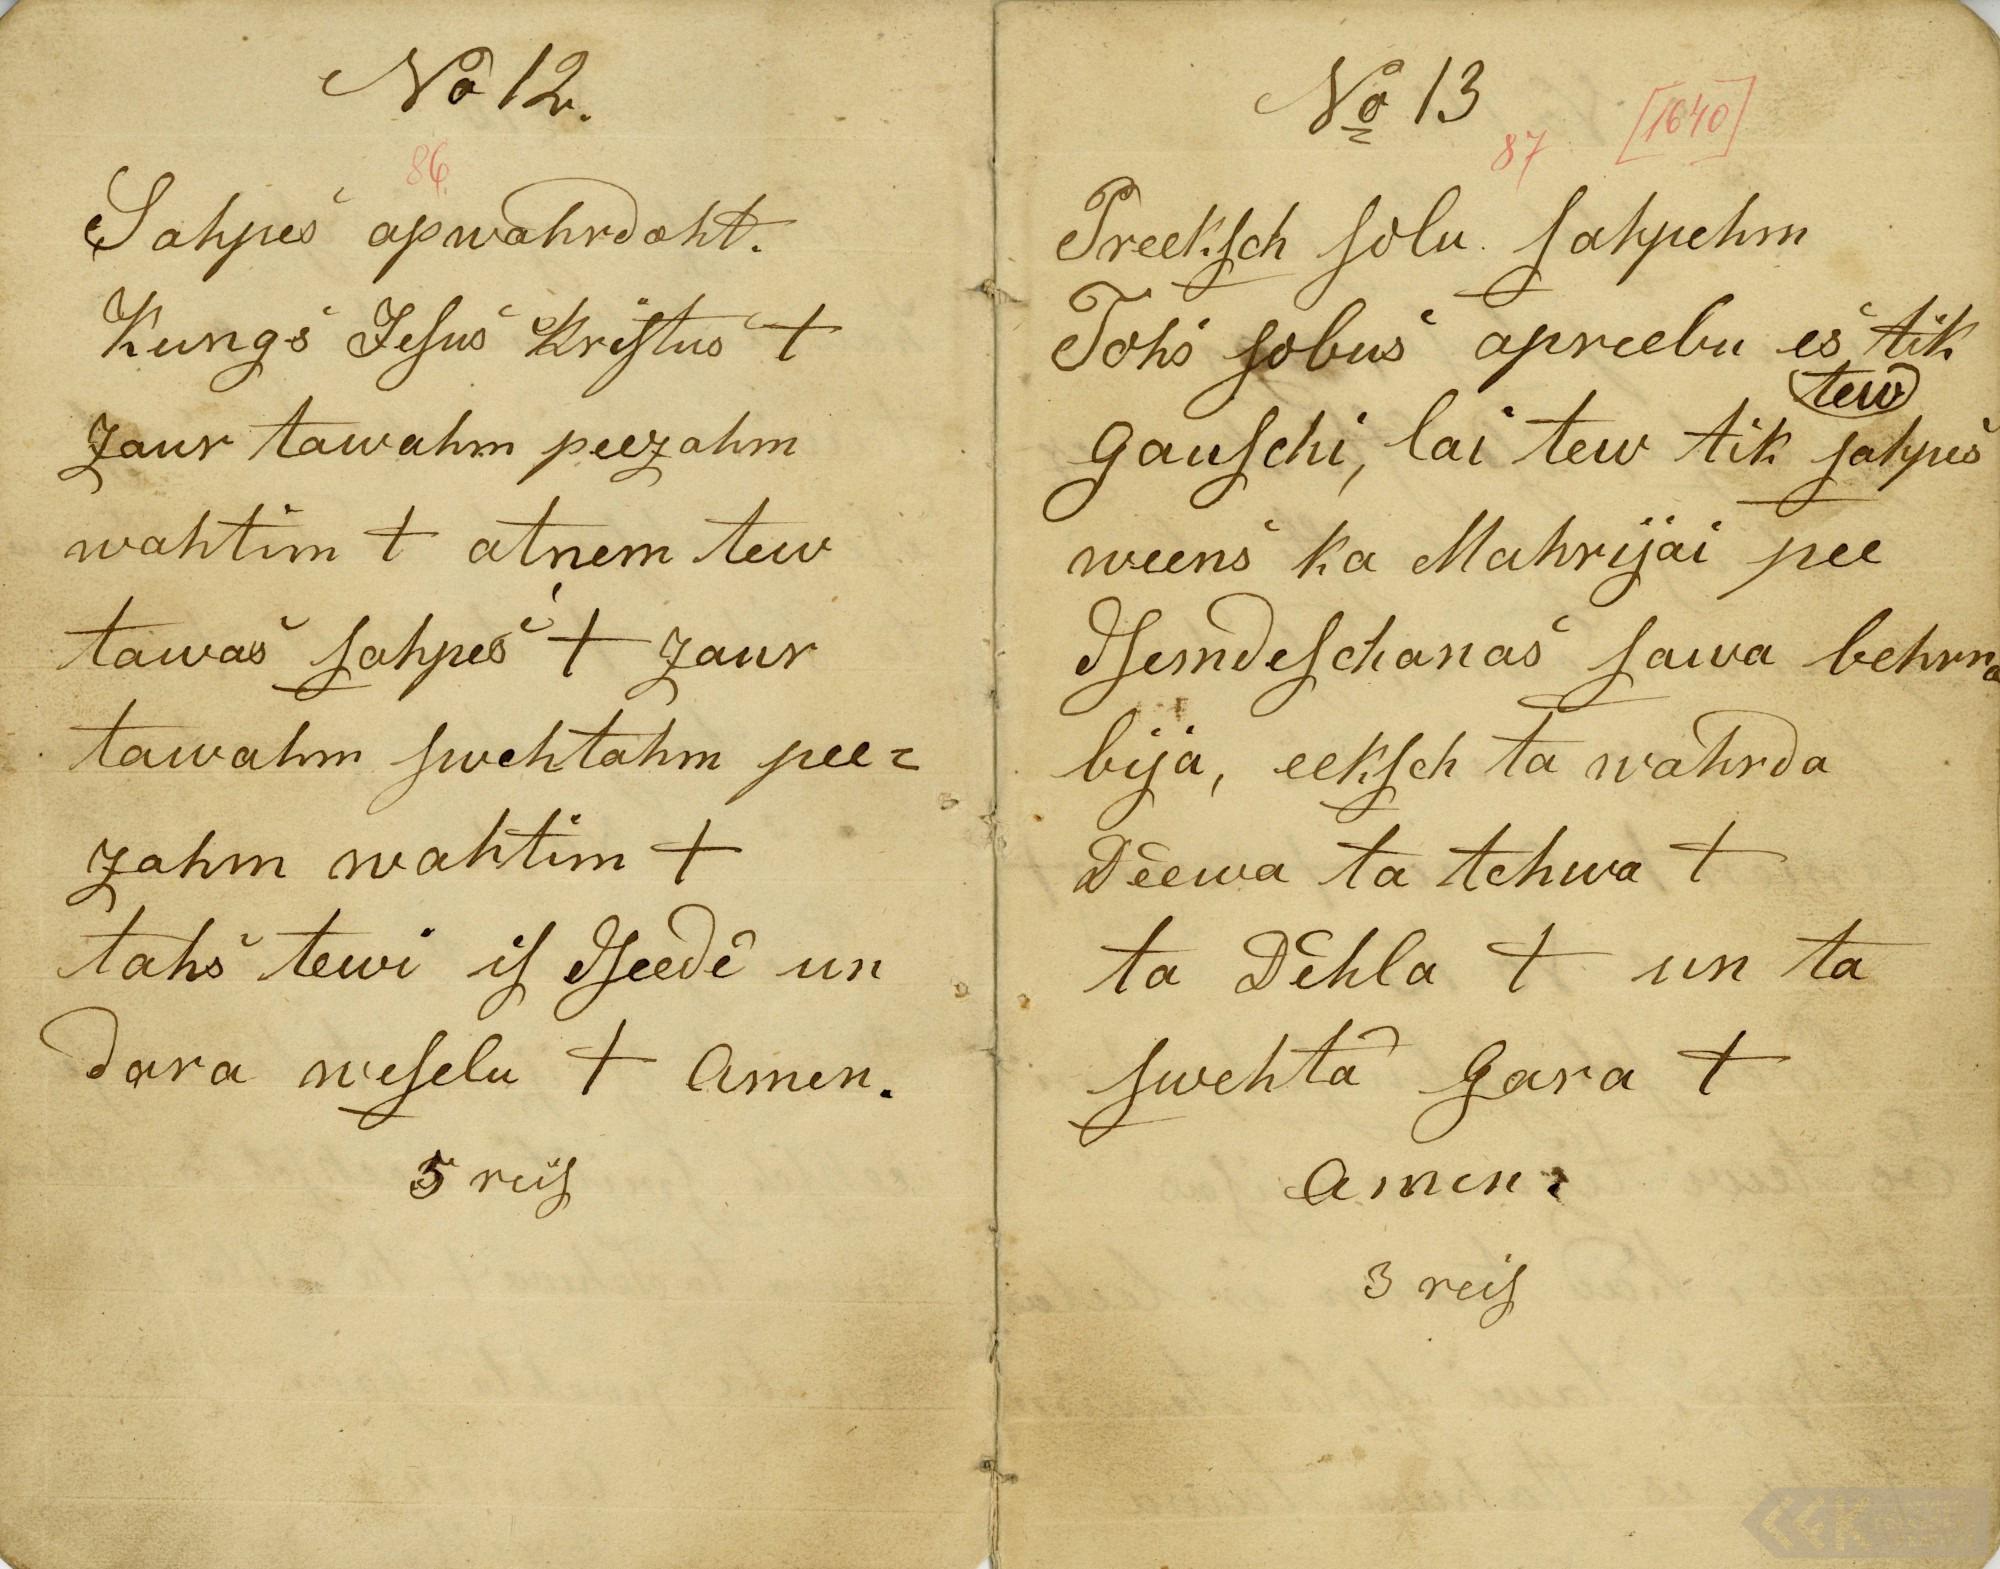 1640-Janis-Alberts-Jansons-01-0042